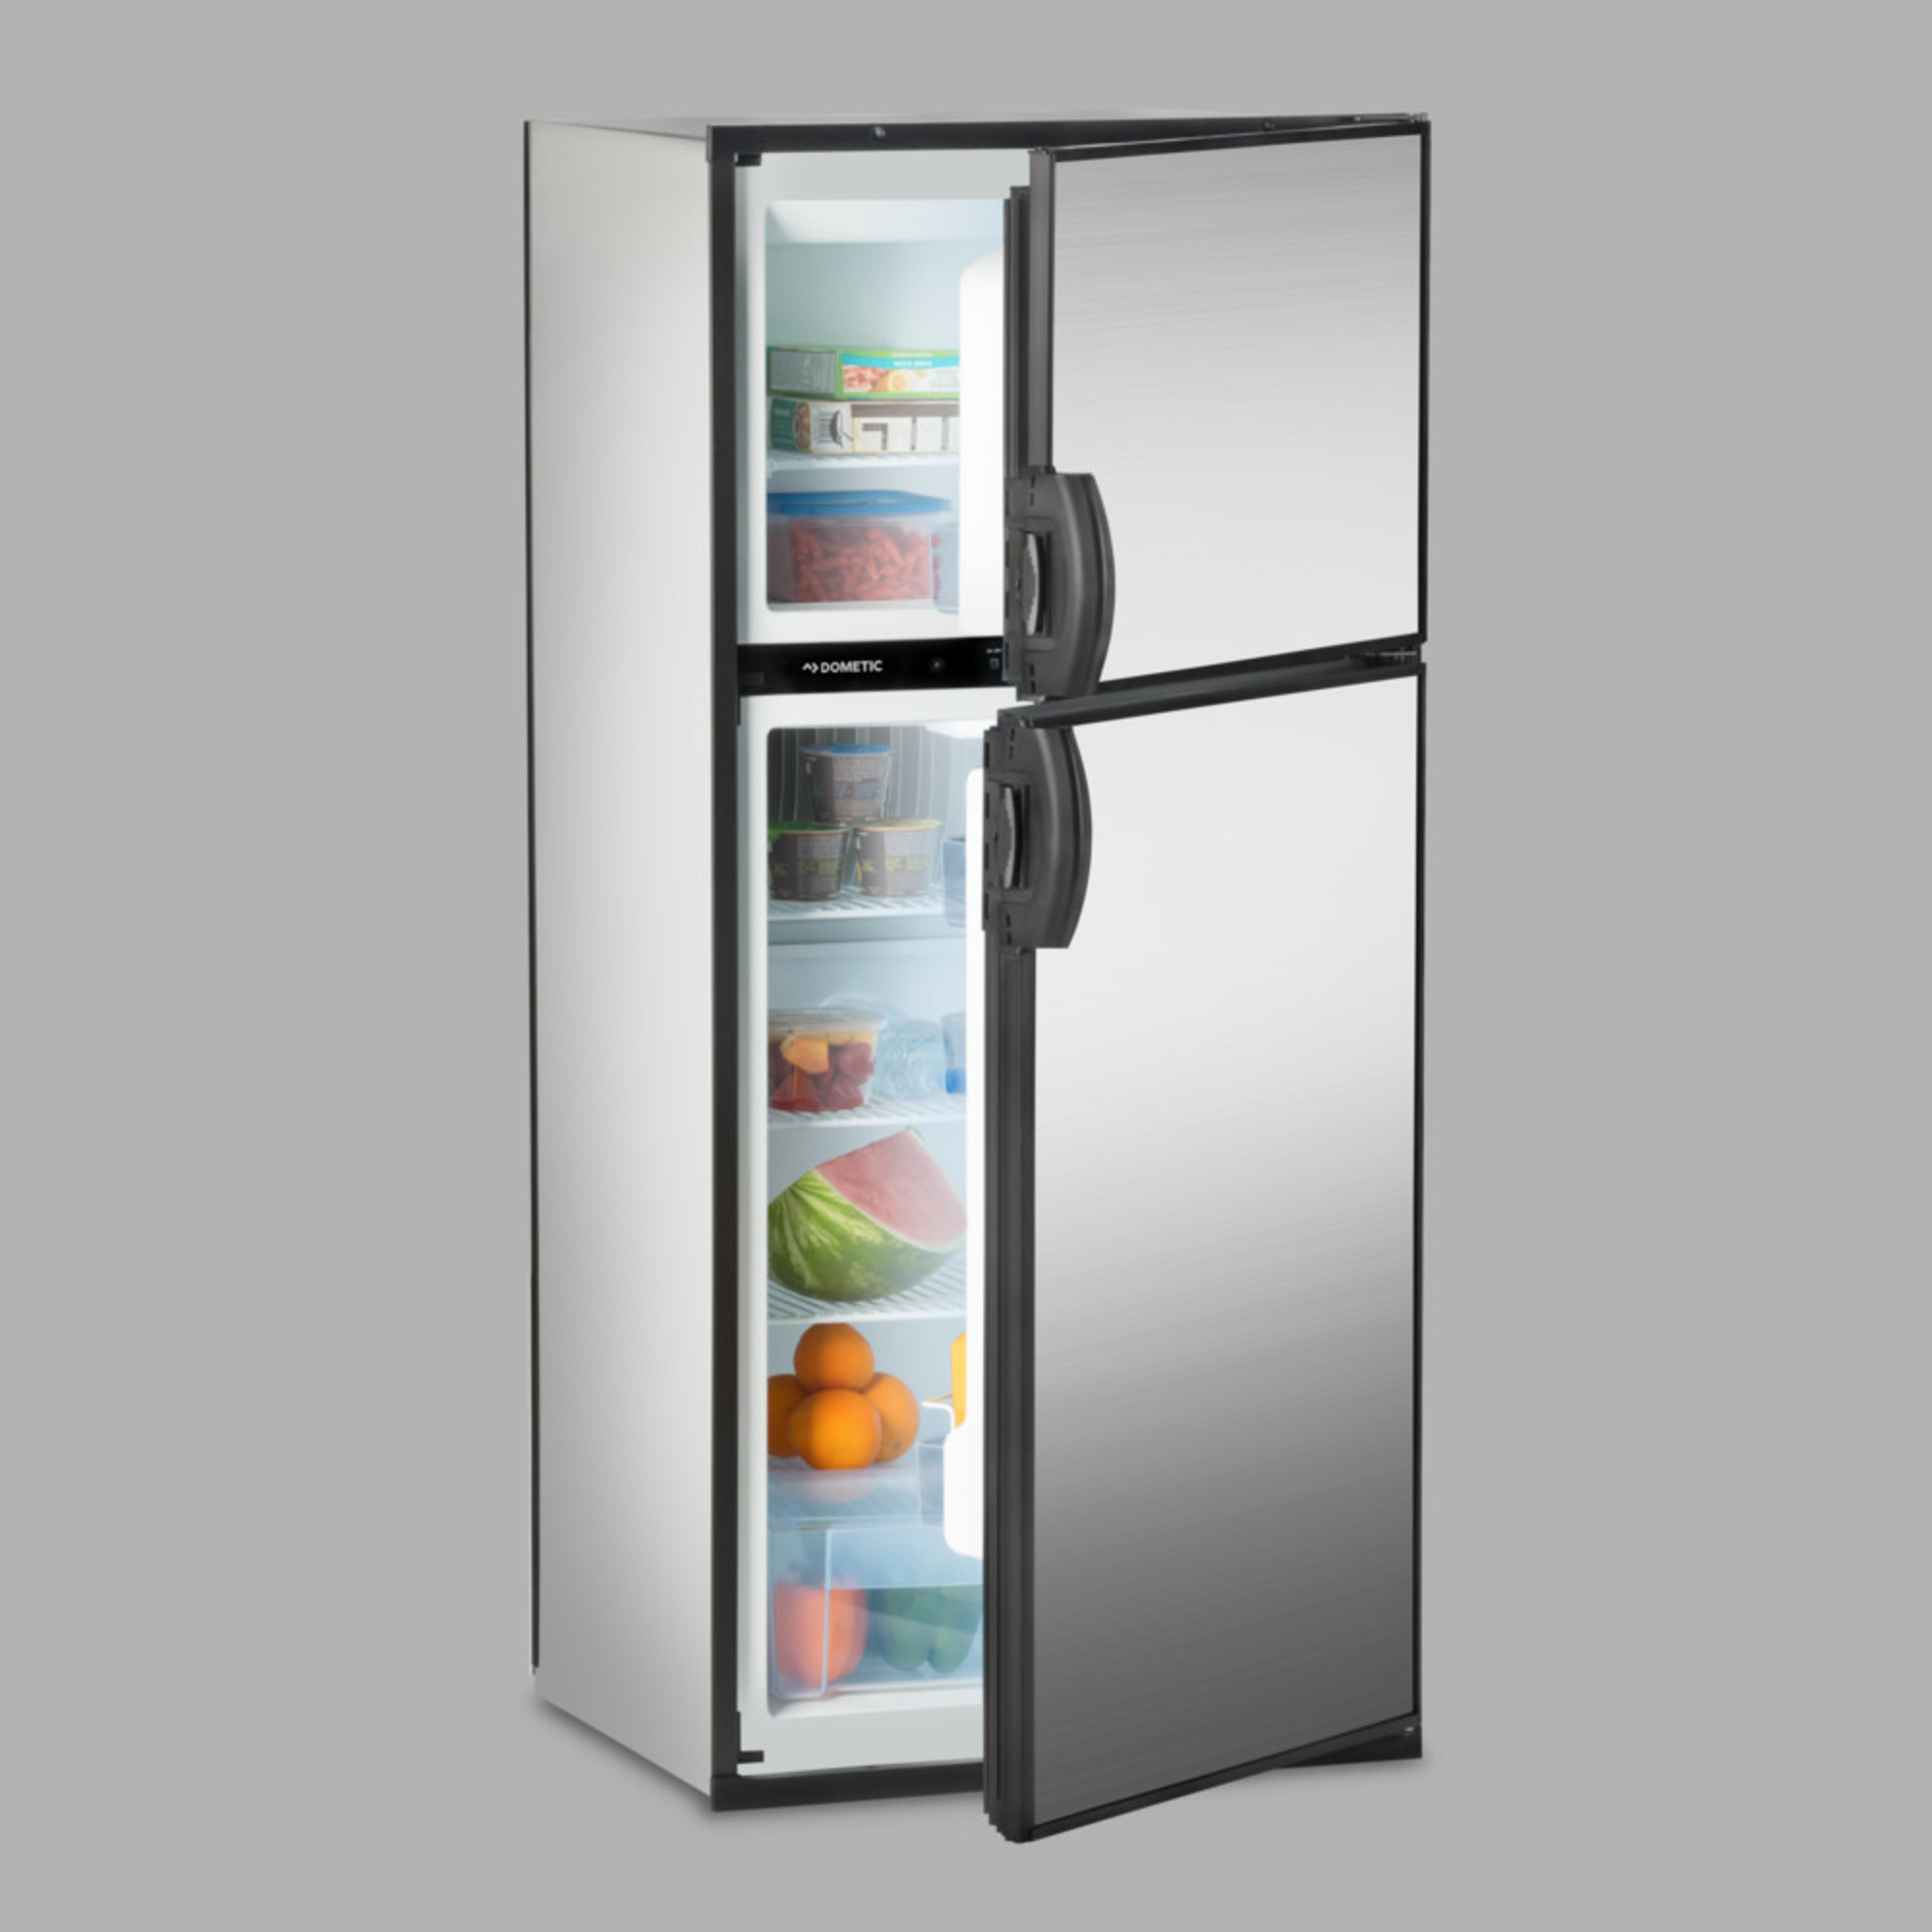 Dometic Renaissance Refrigerator